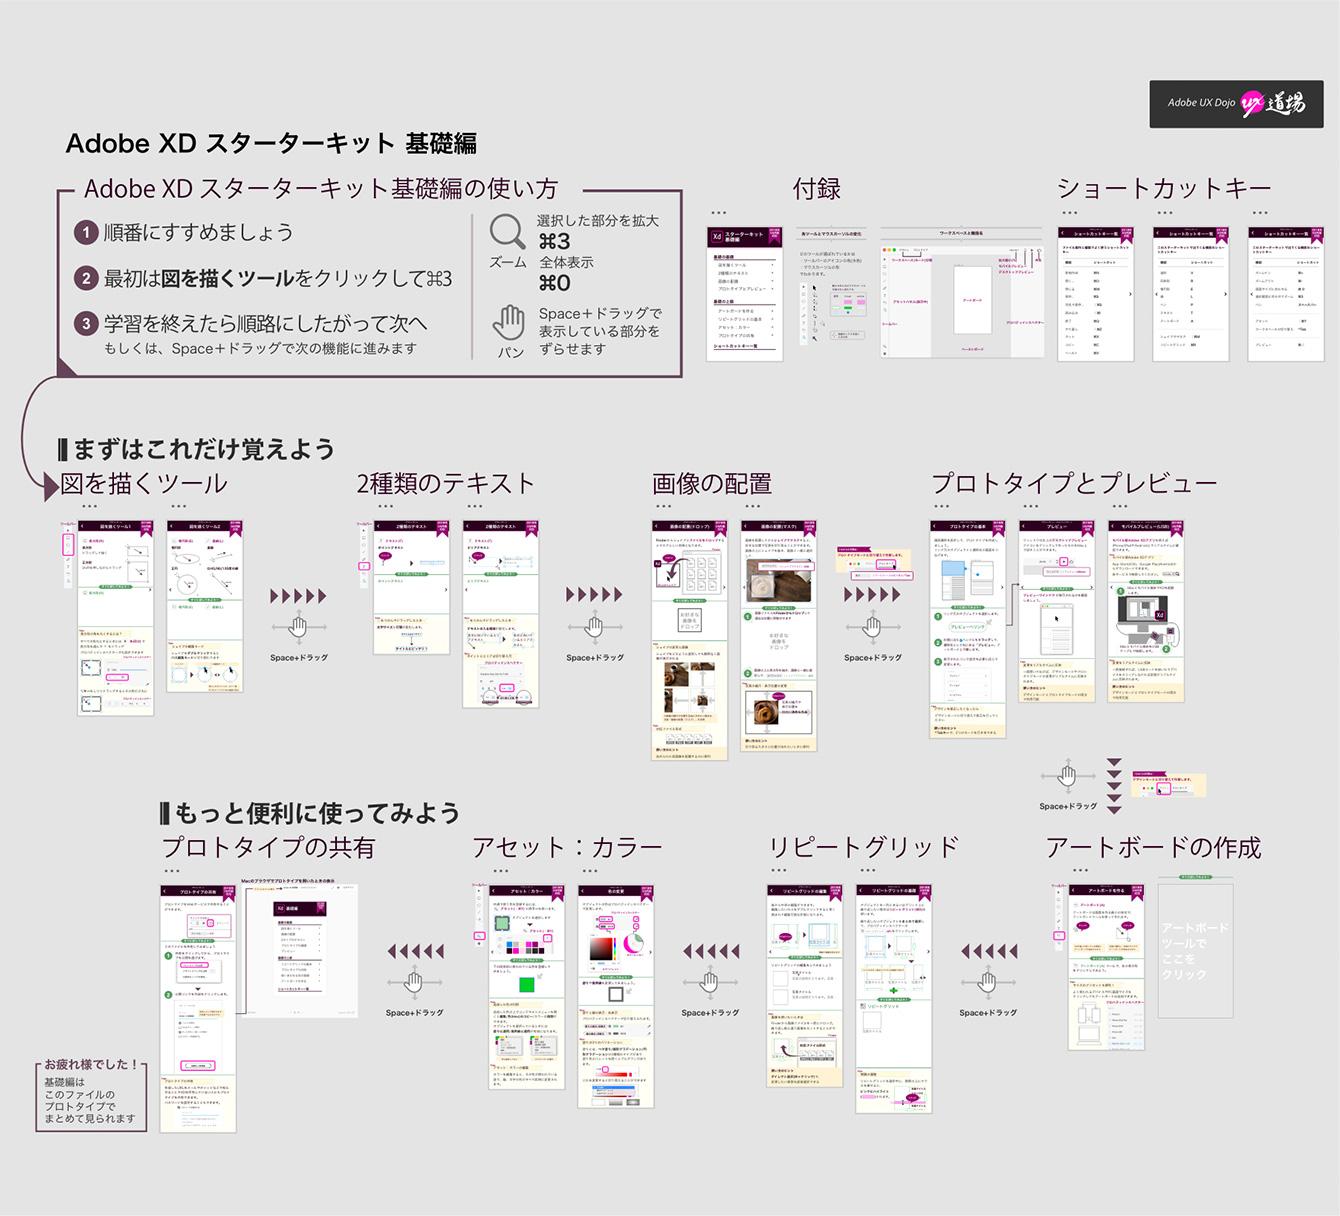 baku-blog_adobeXD_download1